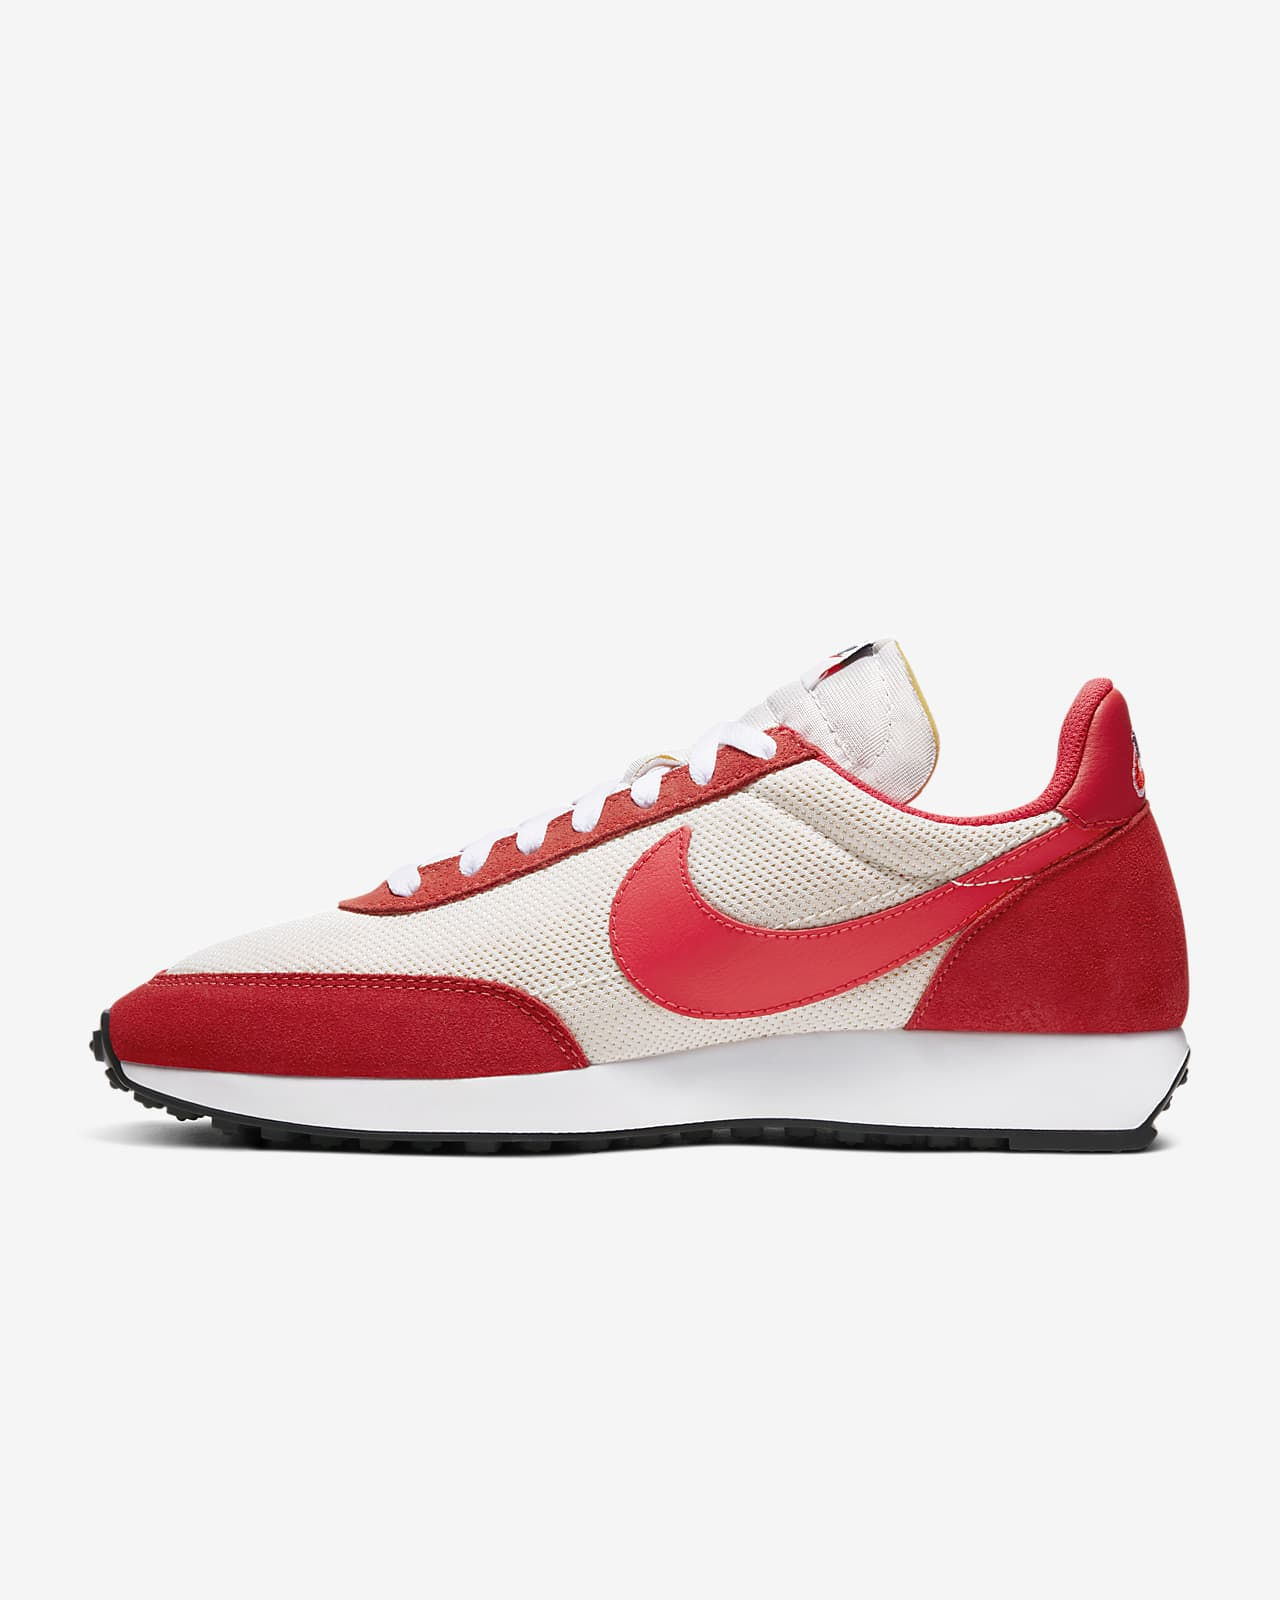 Nike Air Tailwind 79 Shoe. Nike NL